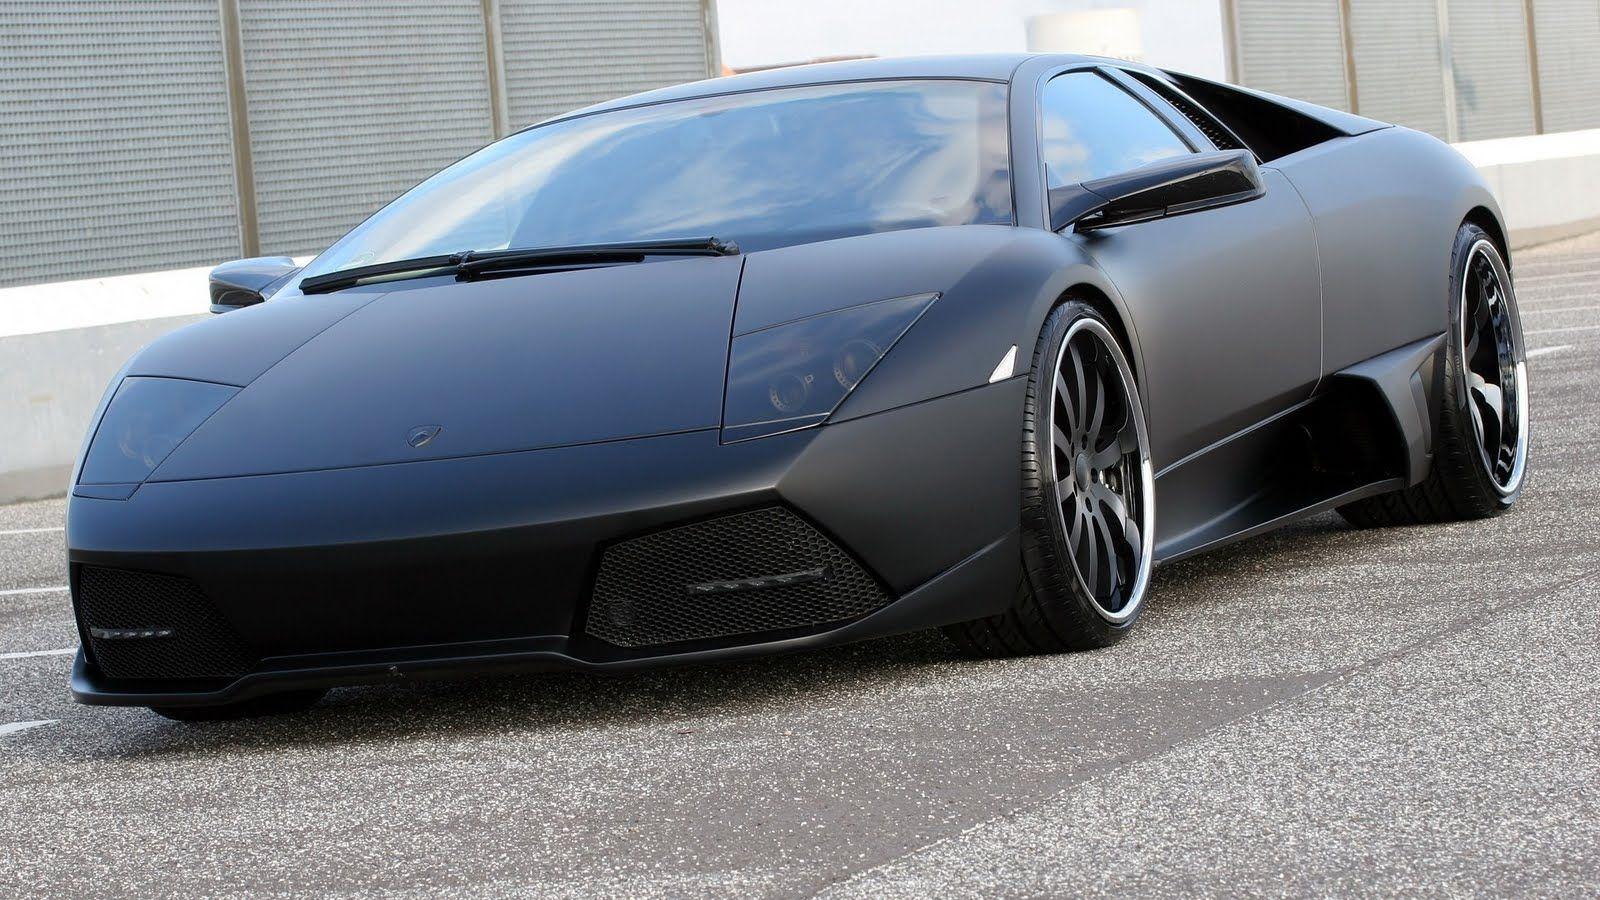 Lamborghini Murcielago Matte Black Hot Rides Ferrari Car